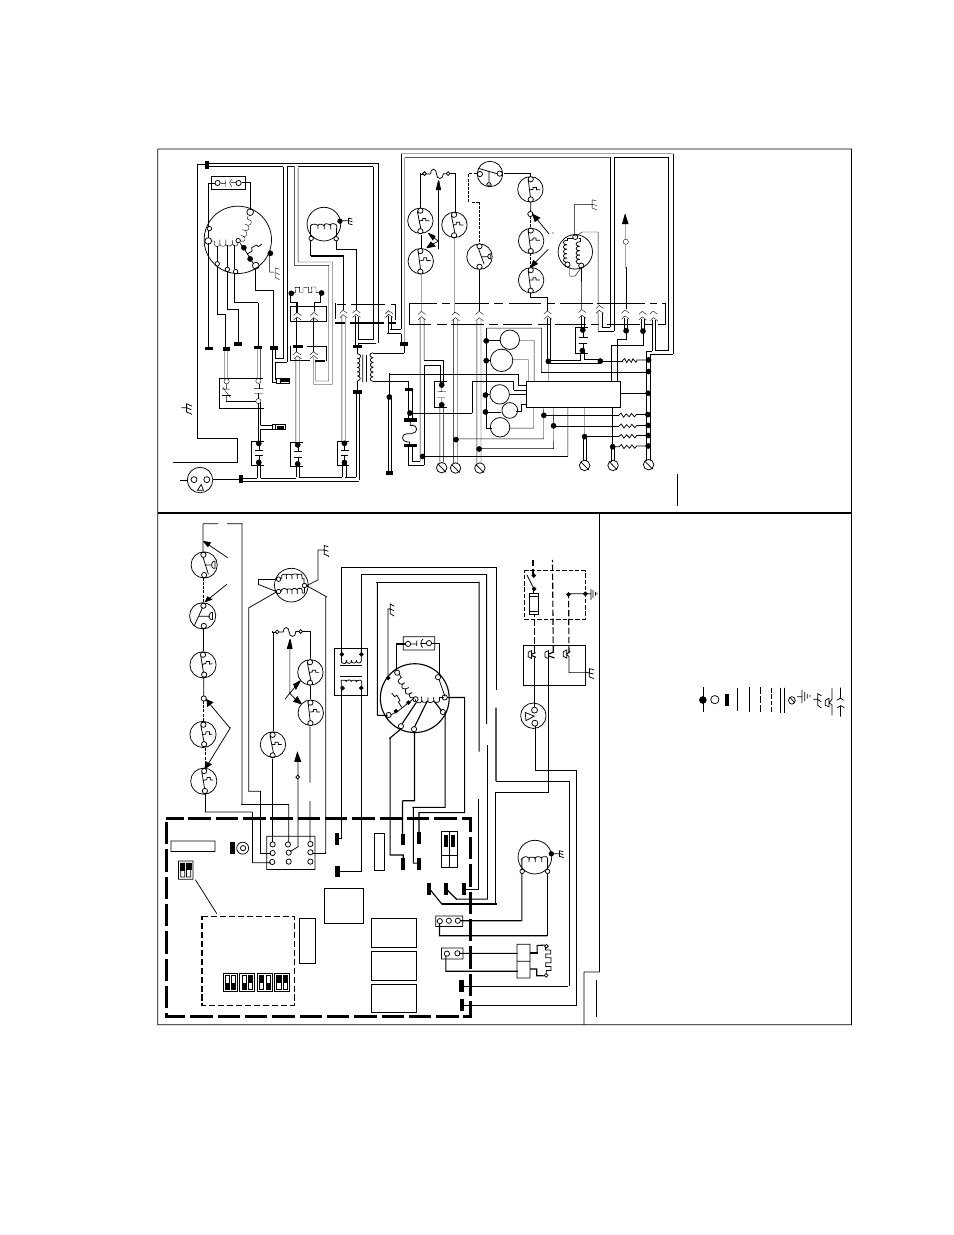 16—furnace wiring diagram | Bryant 373LAV User Manual | Page 13 / 20